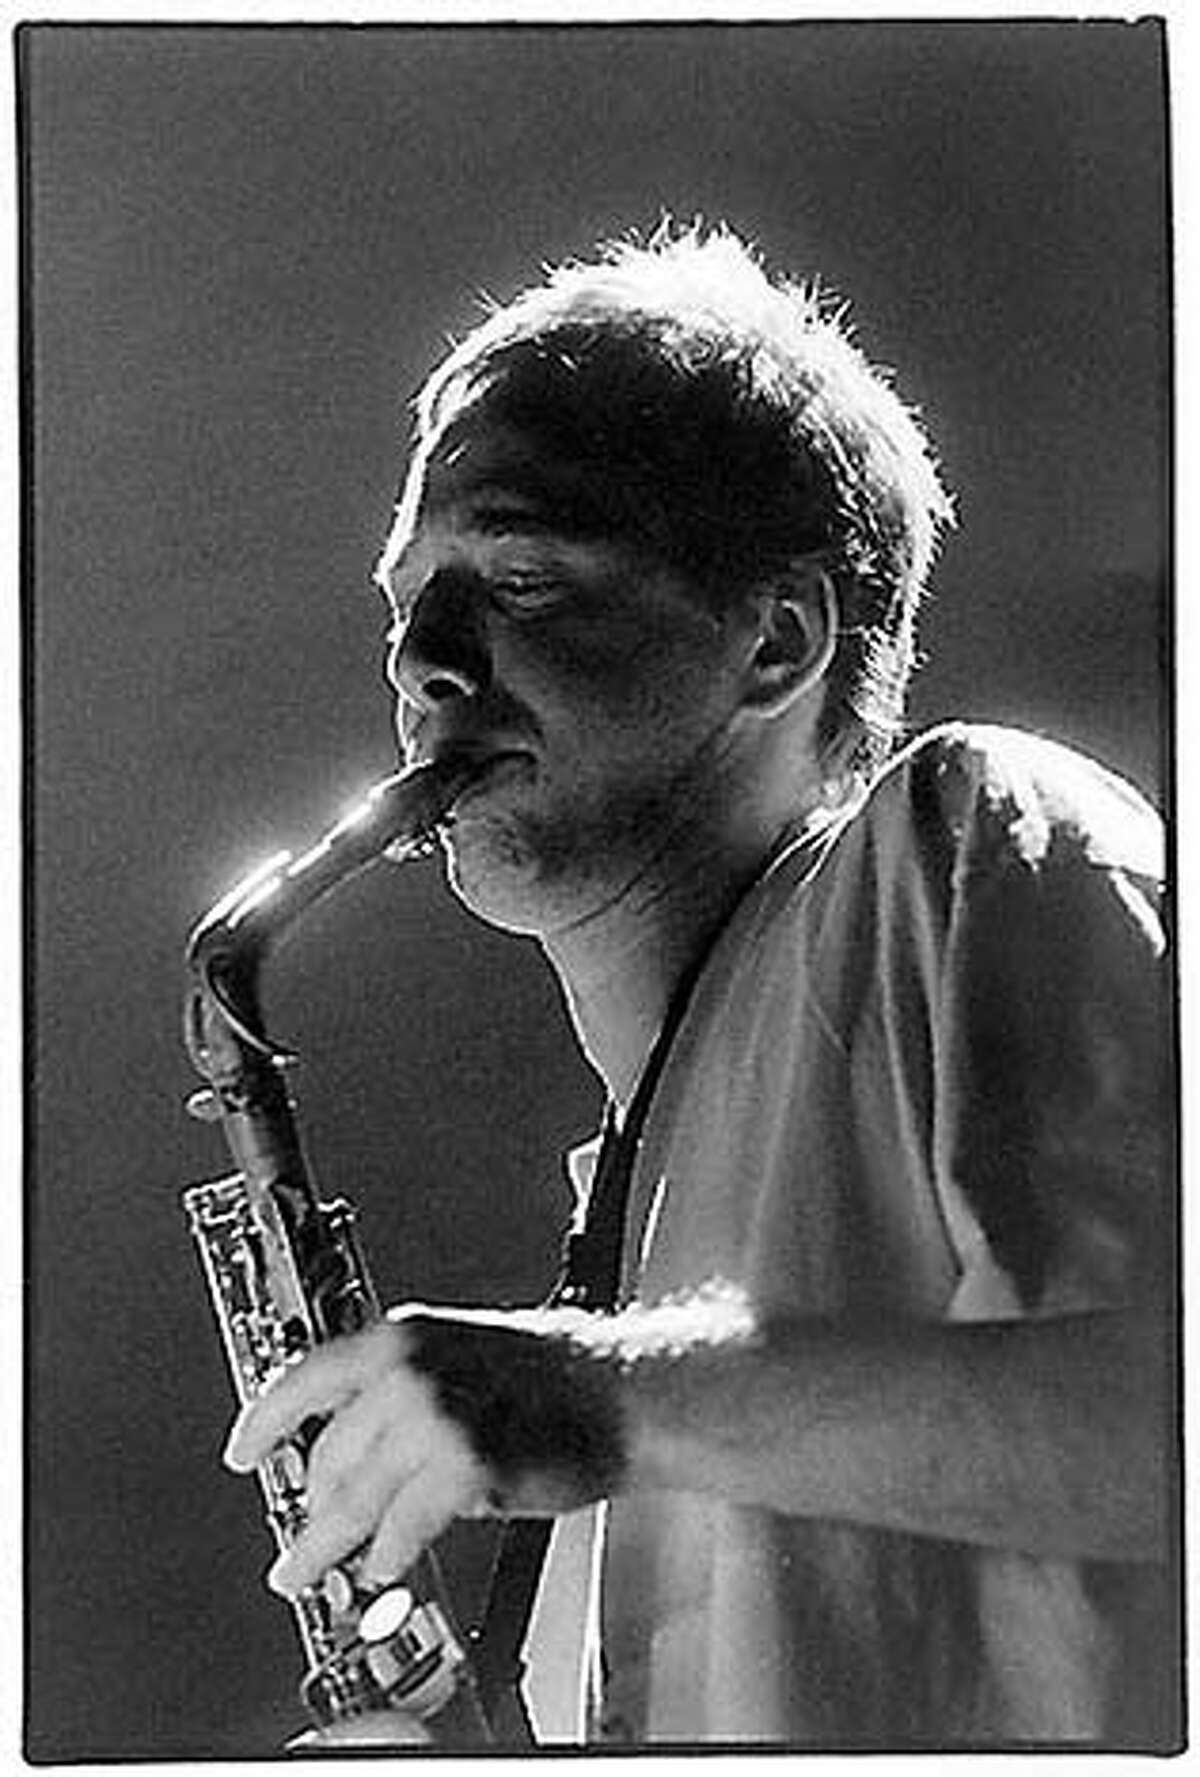 saxophonist composer John Zorn